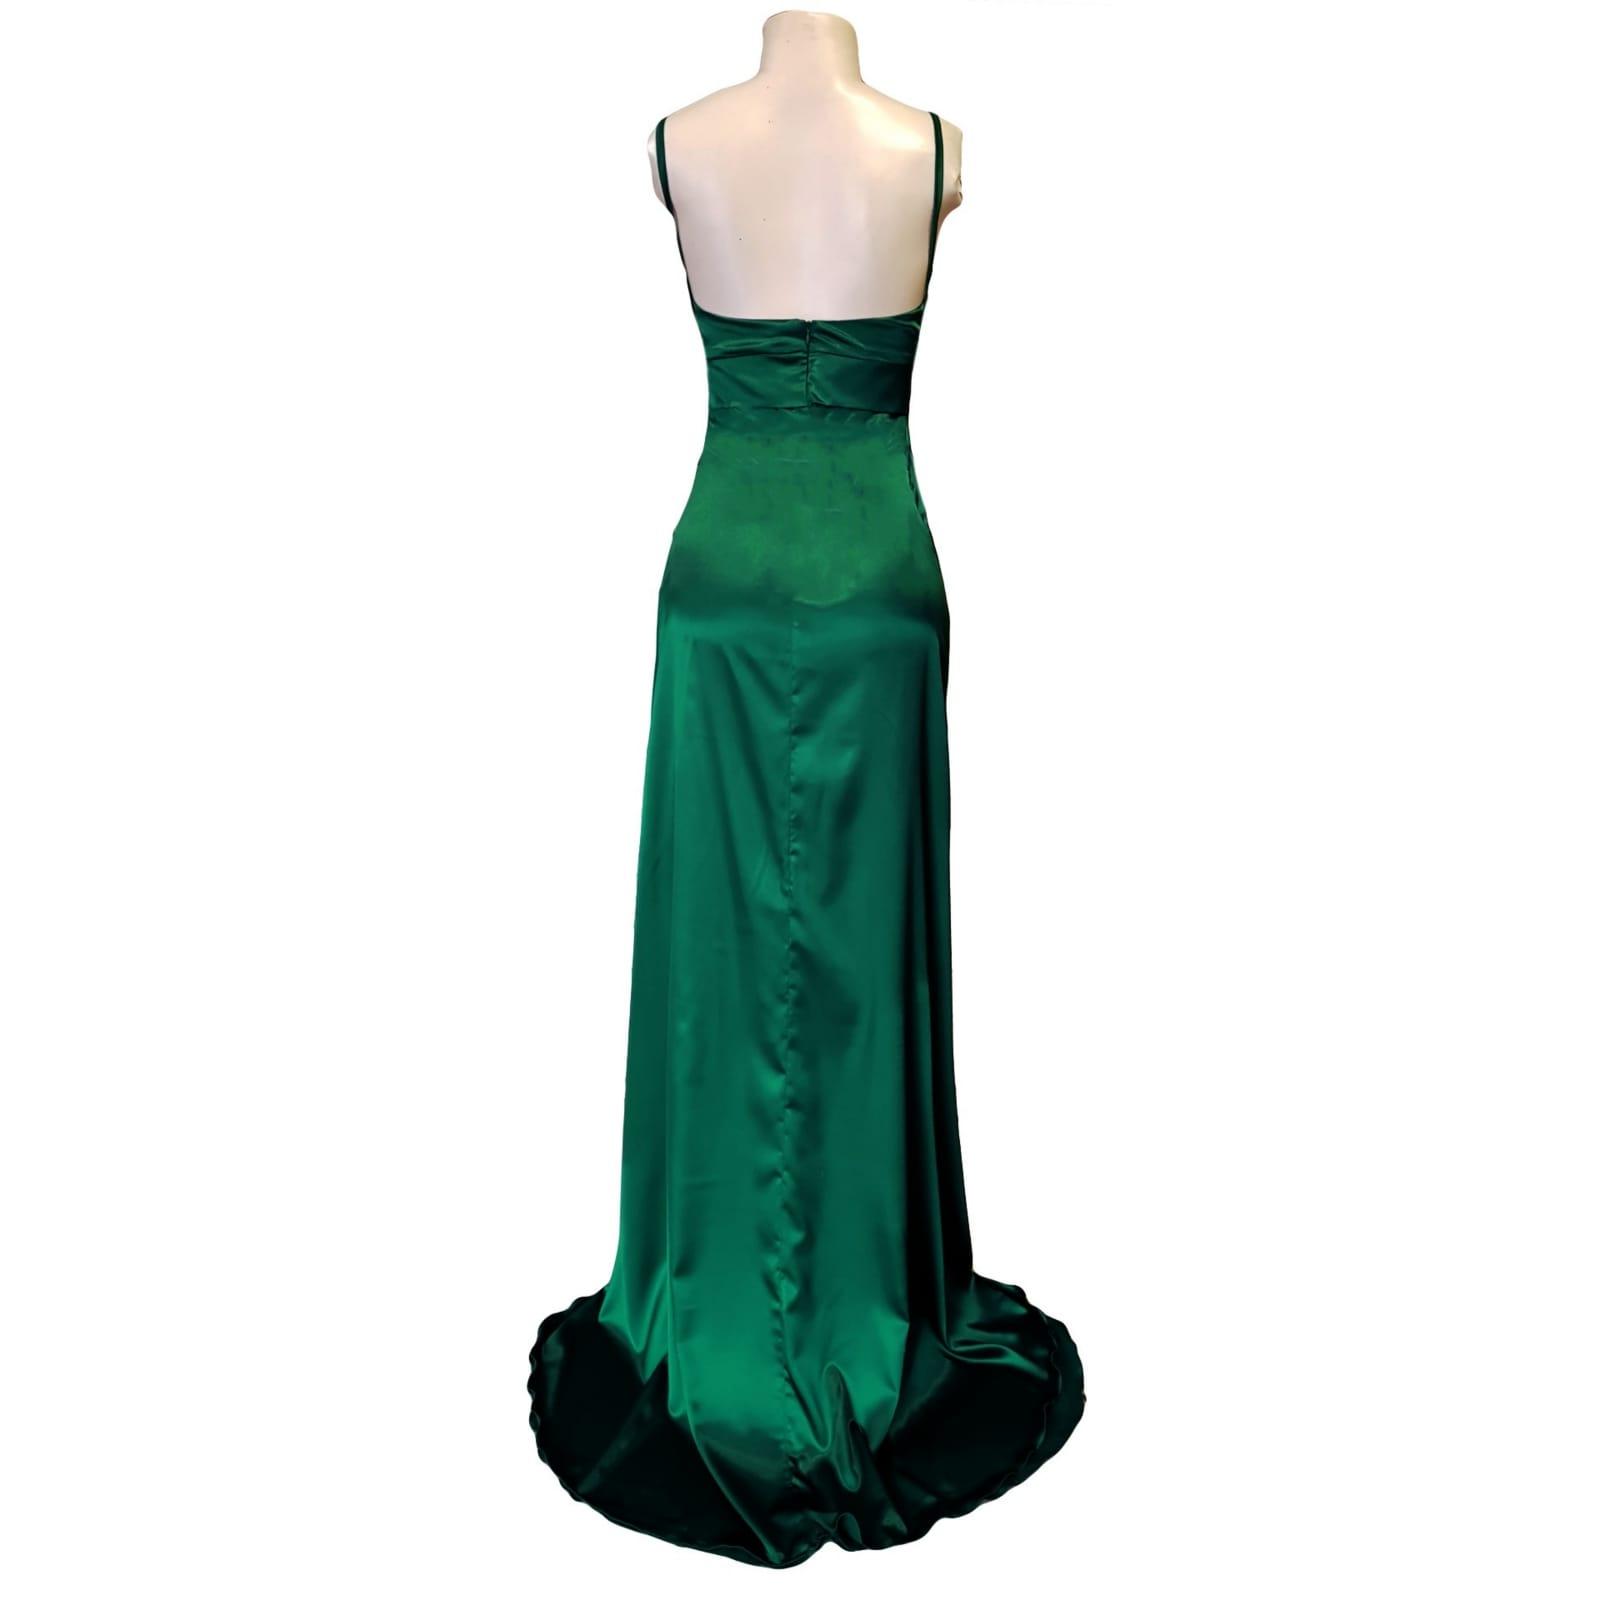 Emerald green long satin prom dress 4 emerald green long satin prom dress. With a high crossed slit and a train.